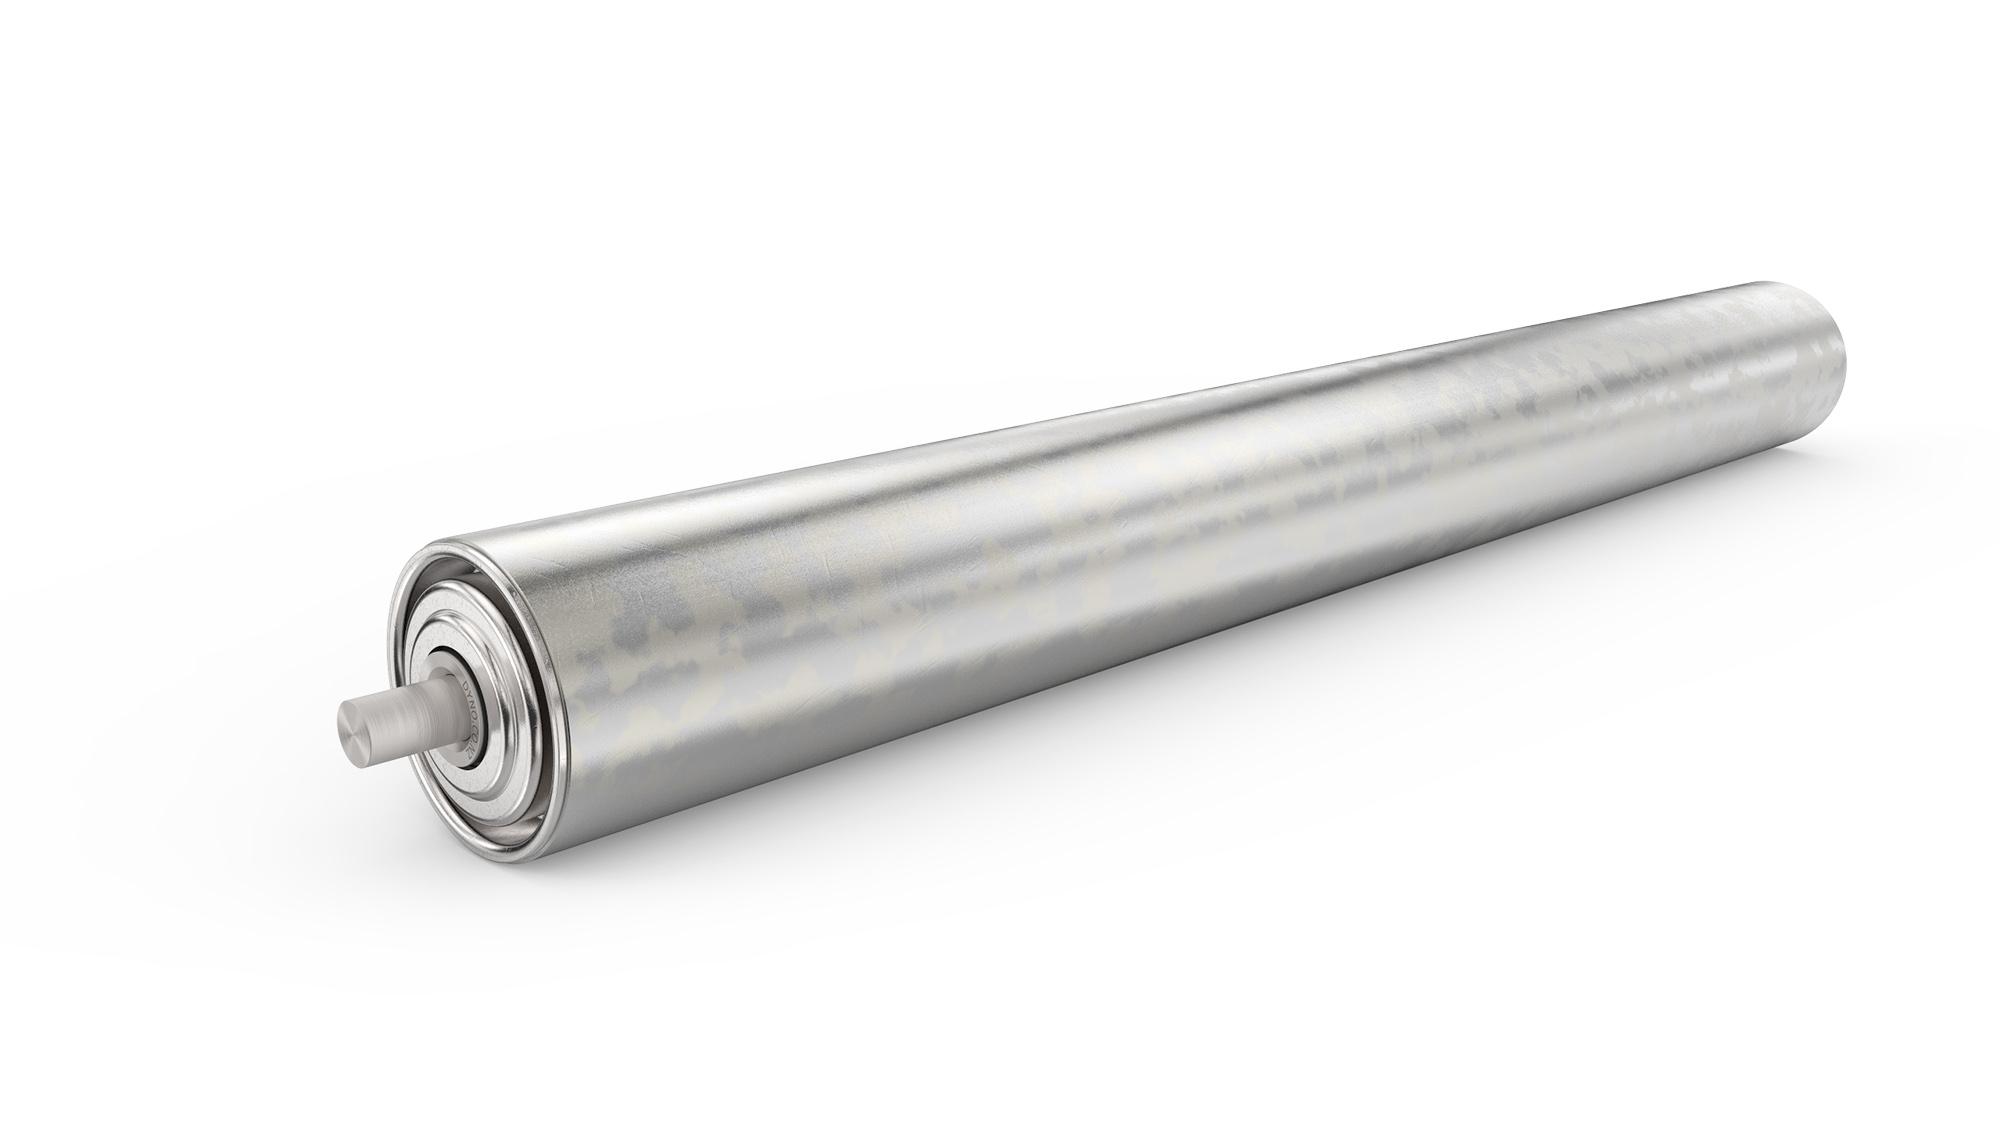 505 Galvanized Roller Dyno Conveyors Roller Belt